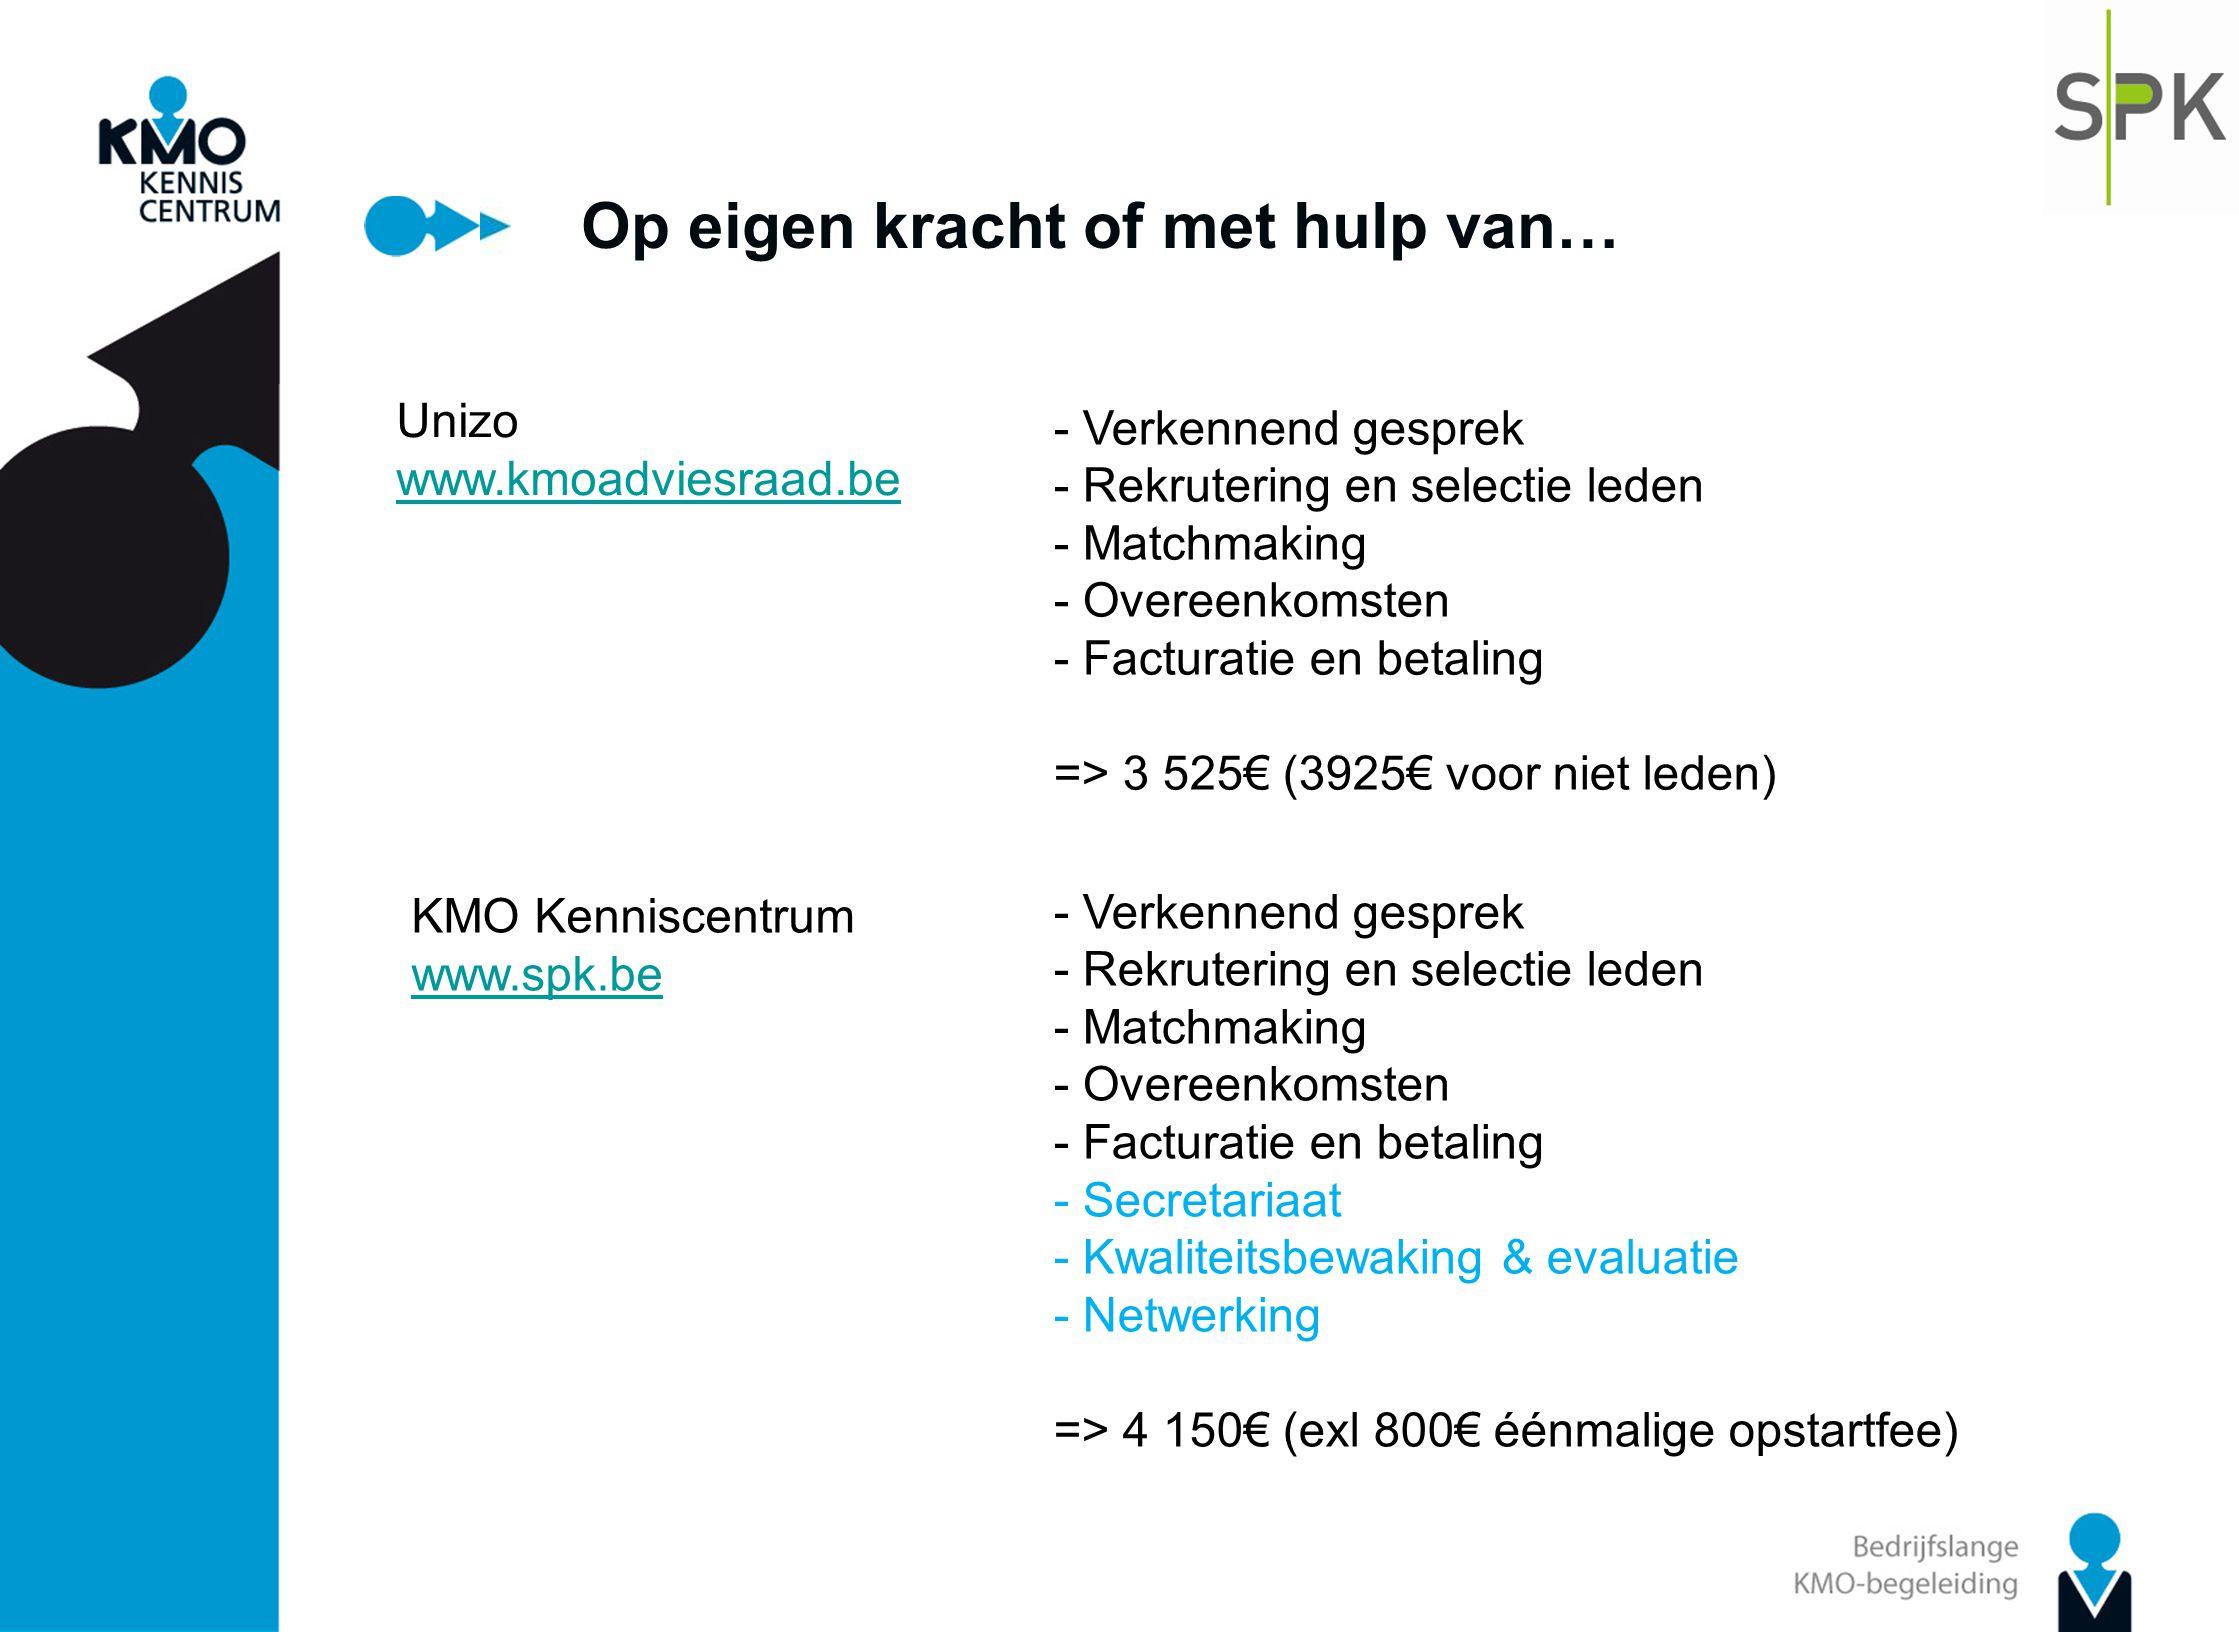 Op eigen kracht of met hulp van… Unizo www.kmoadviesraad.be - Verkennend gesprek - Rekrutering en selectie leden - Matchmaking - Overeenkomsten - Fact